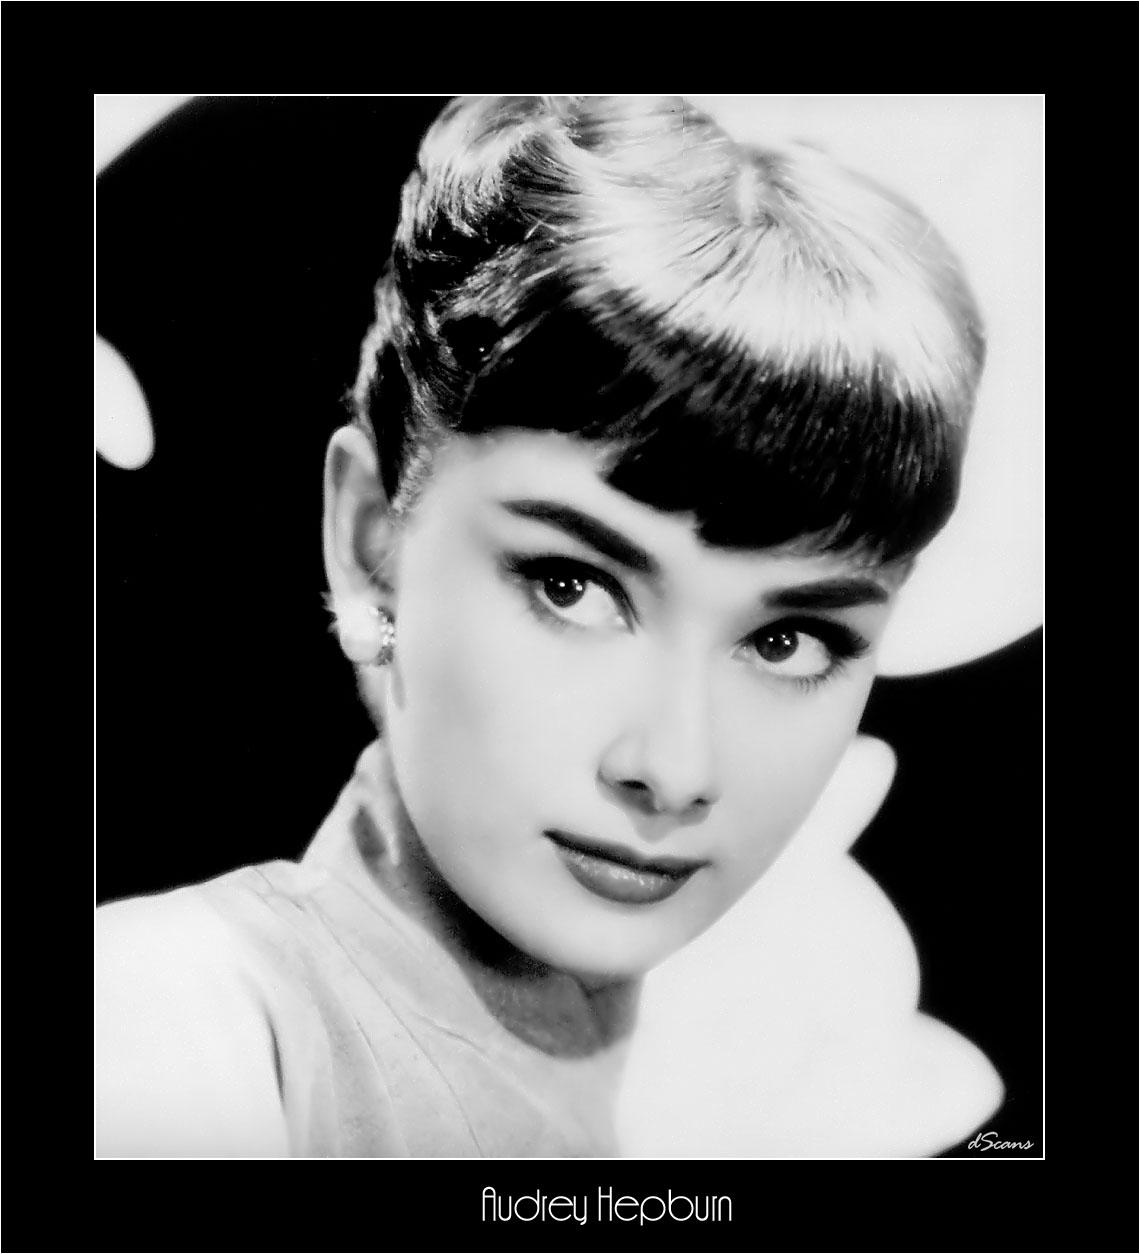 Today's Birthday Bio: Audrey Hepburn | THE B.S. REPORT